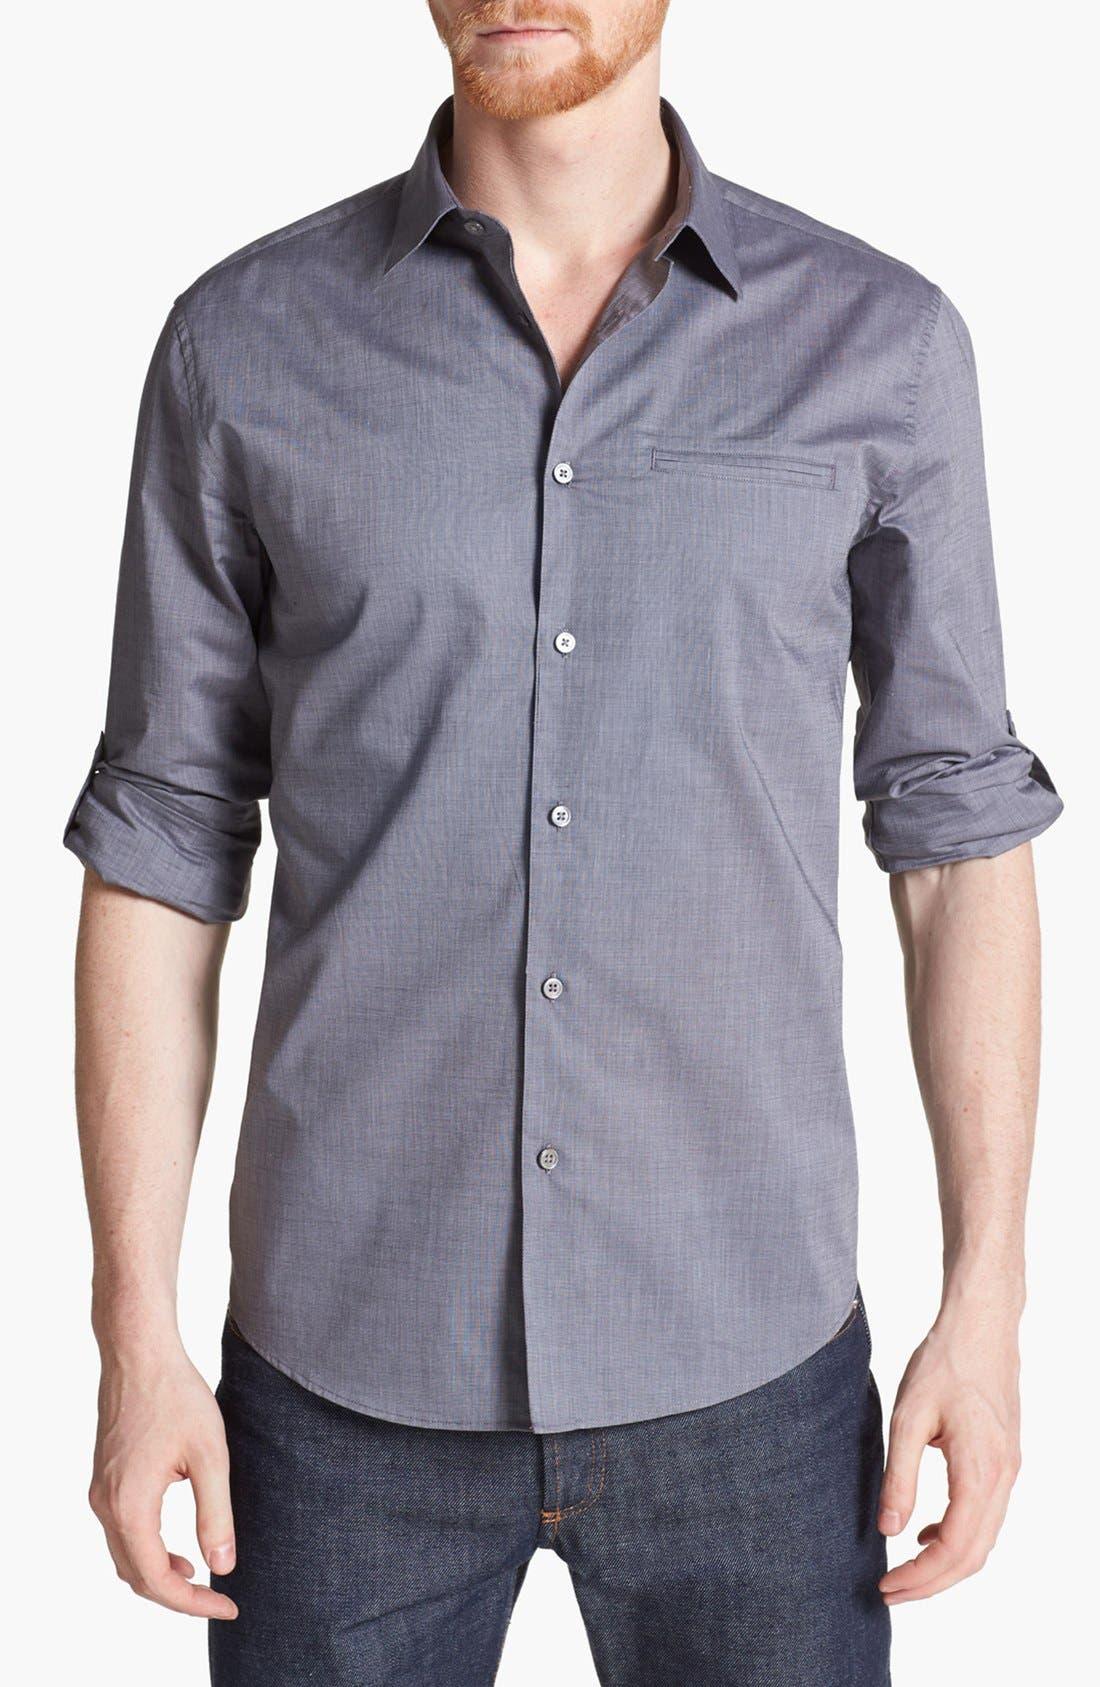 Alternate Image 1 Selected - John Varvatos Collection Slim Fit Cotton Woven Shirt